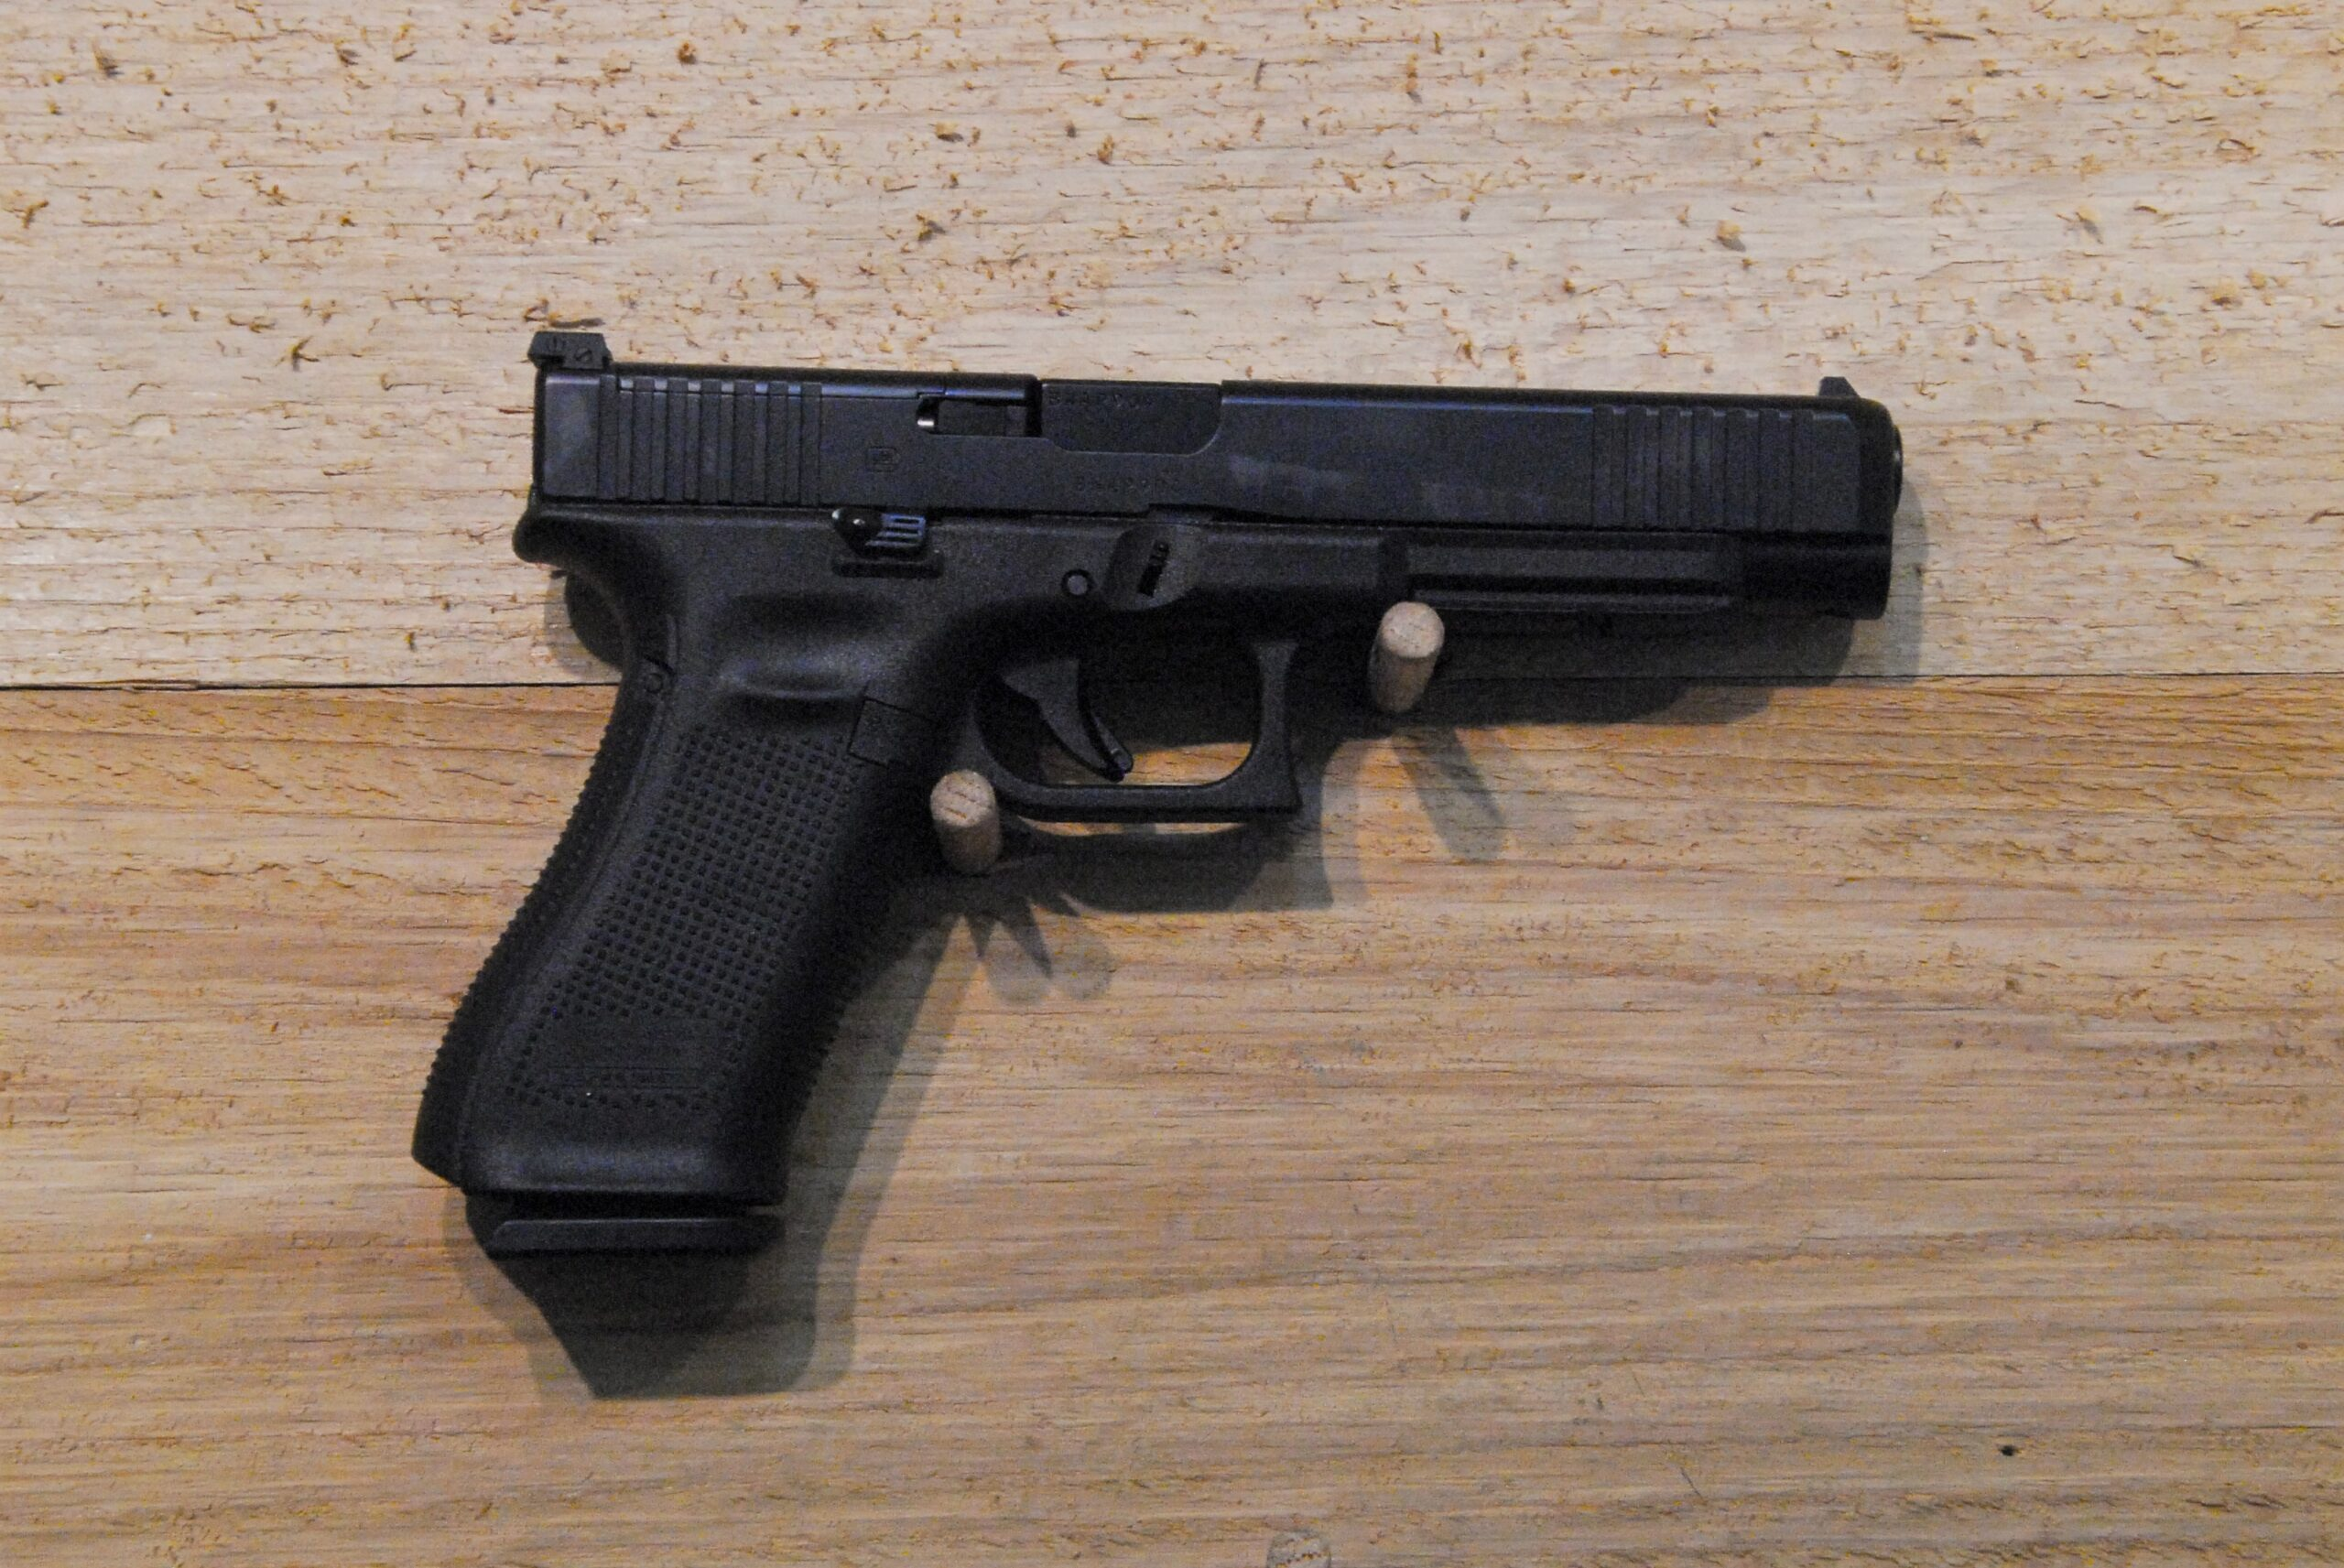 Glock 34 Gen 5 Mos Fss 9mm Adelbridge Co Inc 34 толщина оружия по затвору, мм: adelbridge